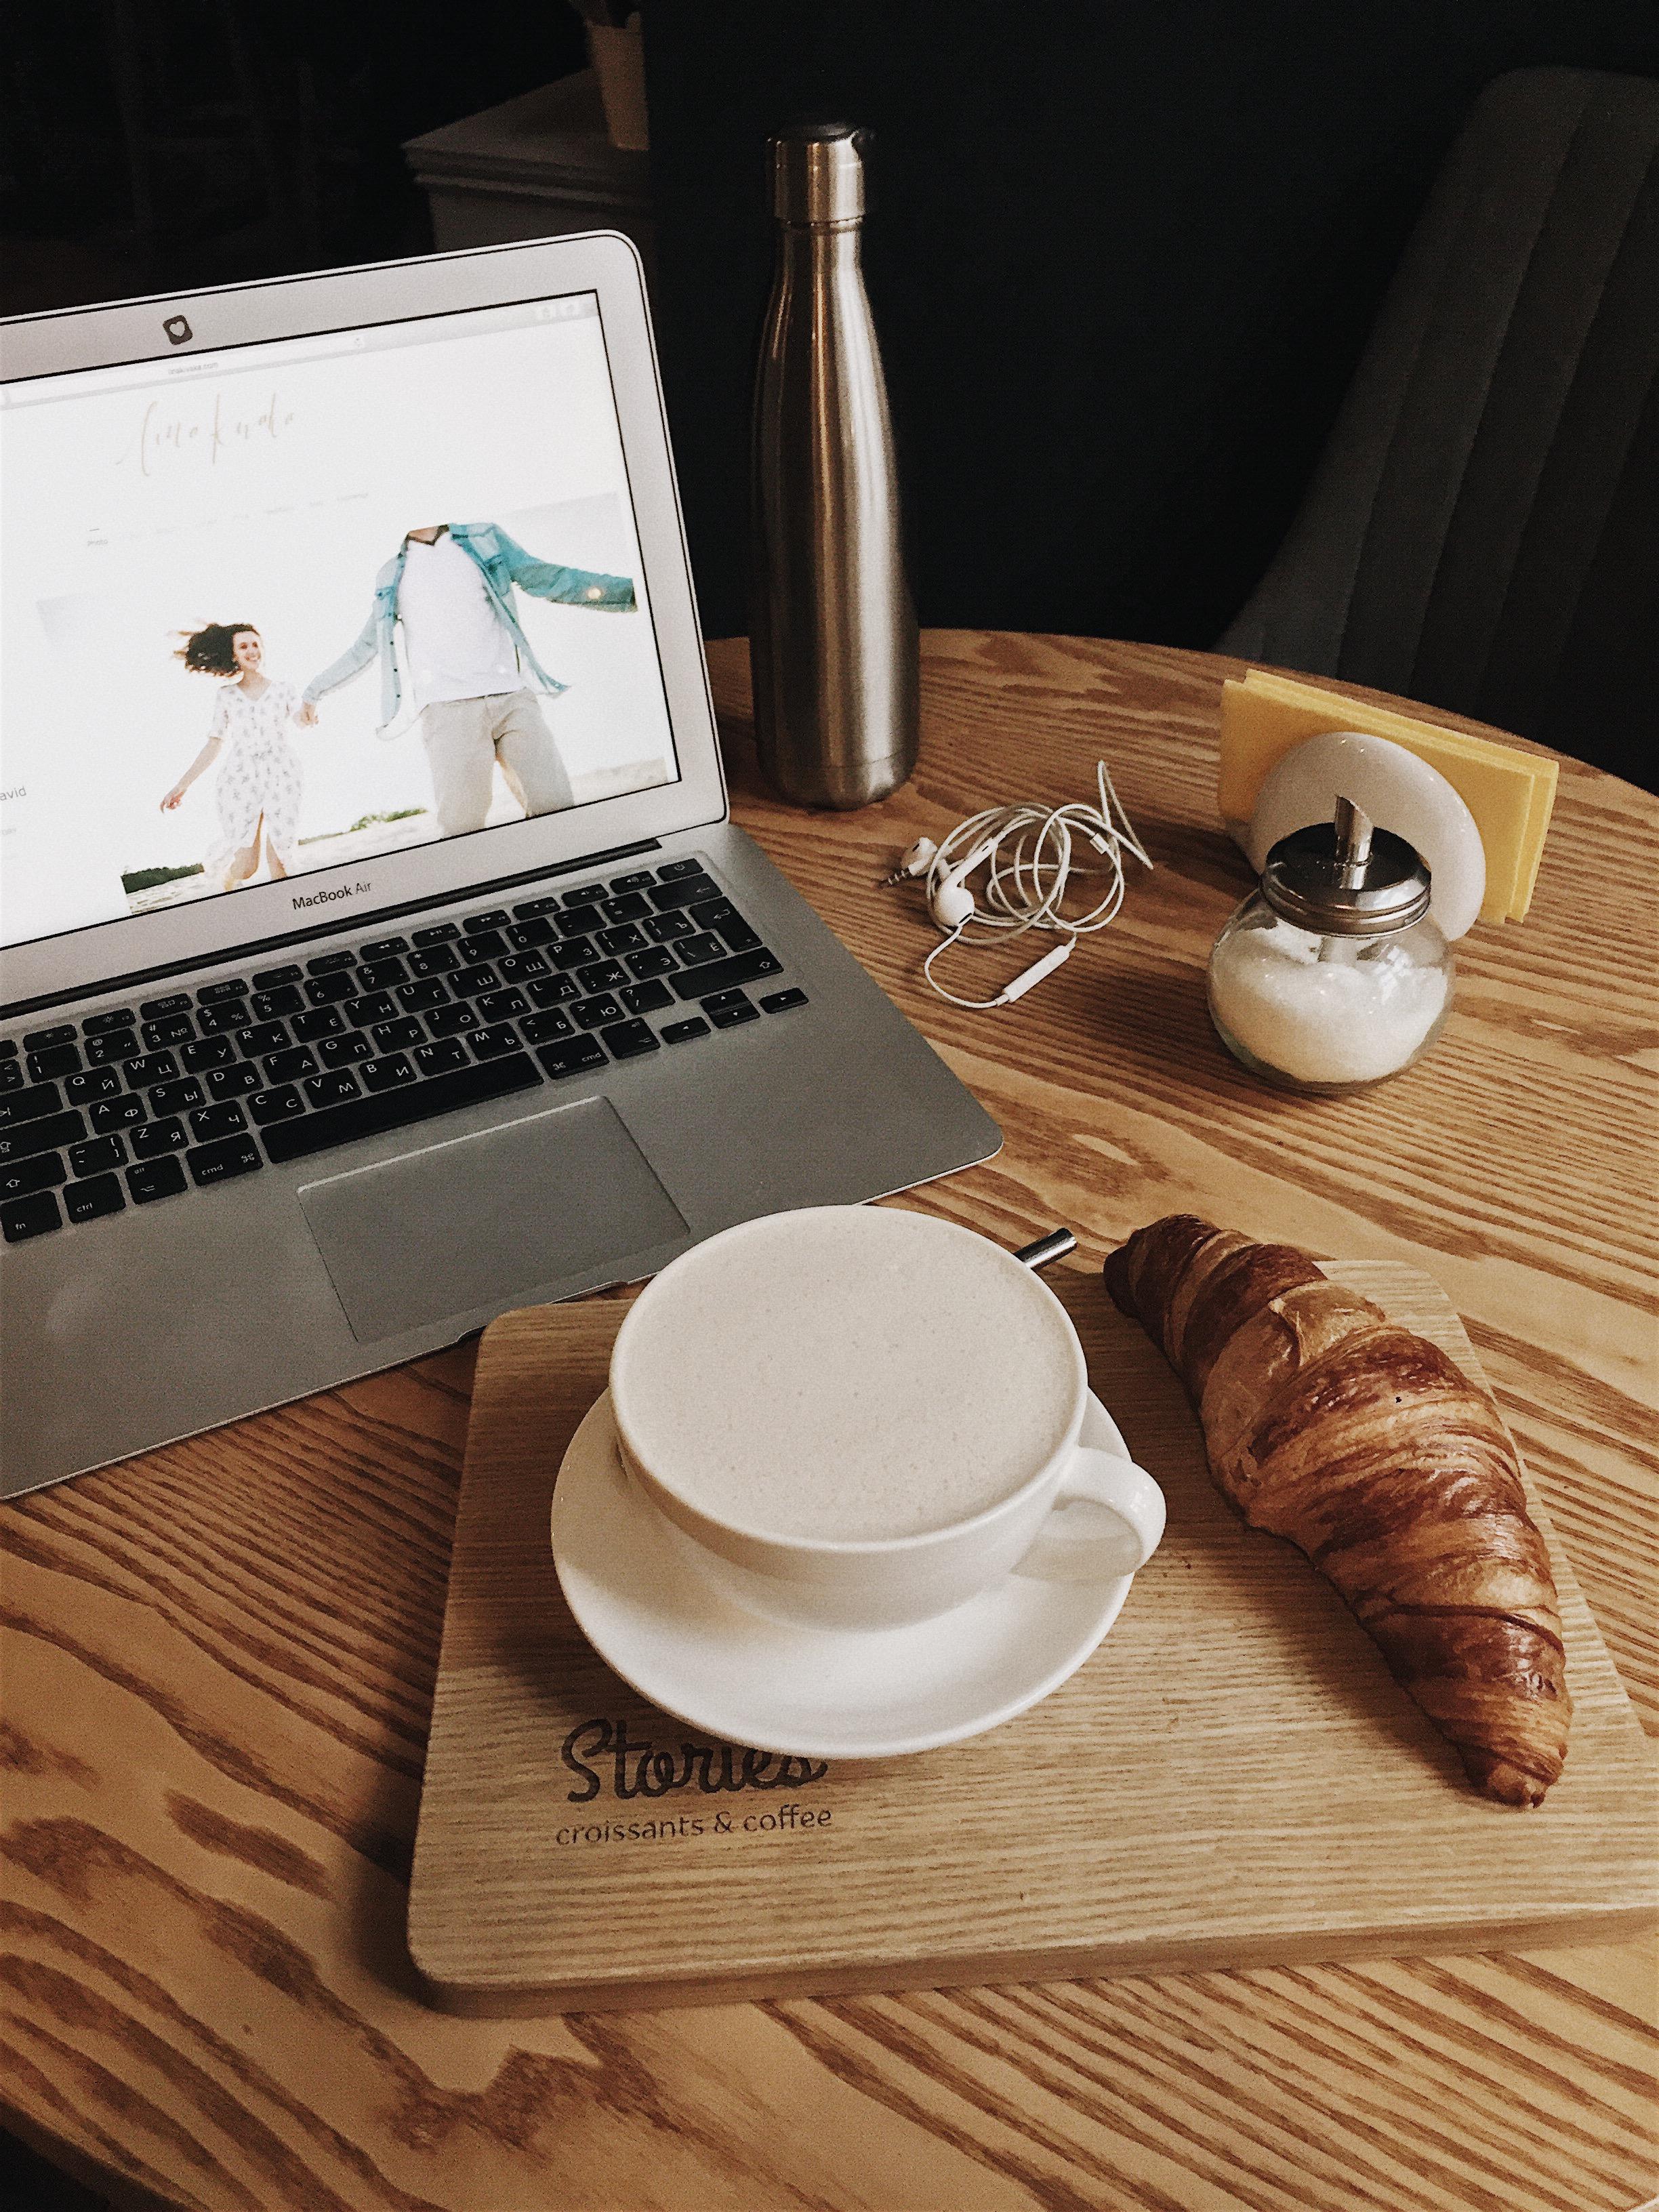 Macbook Pro Beside Teacup